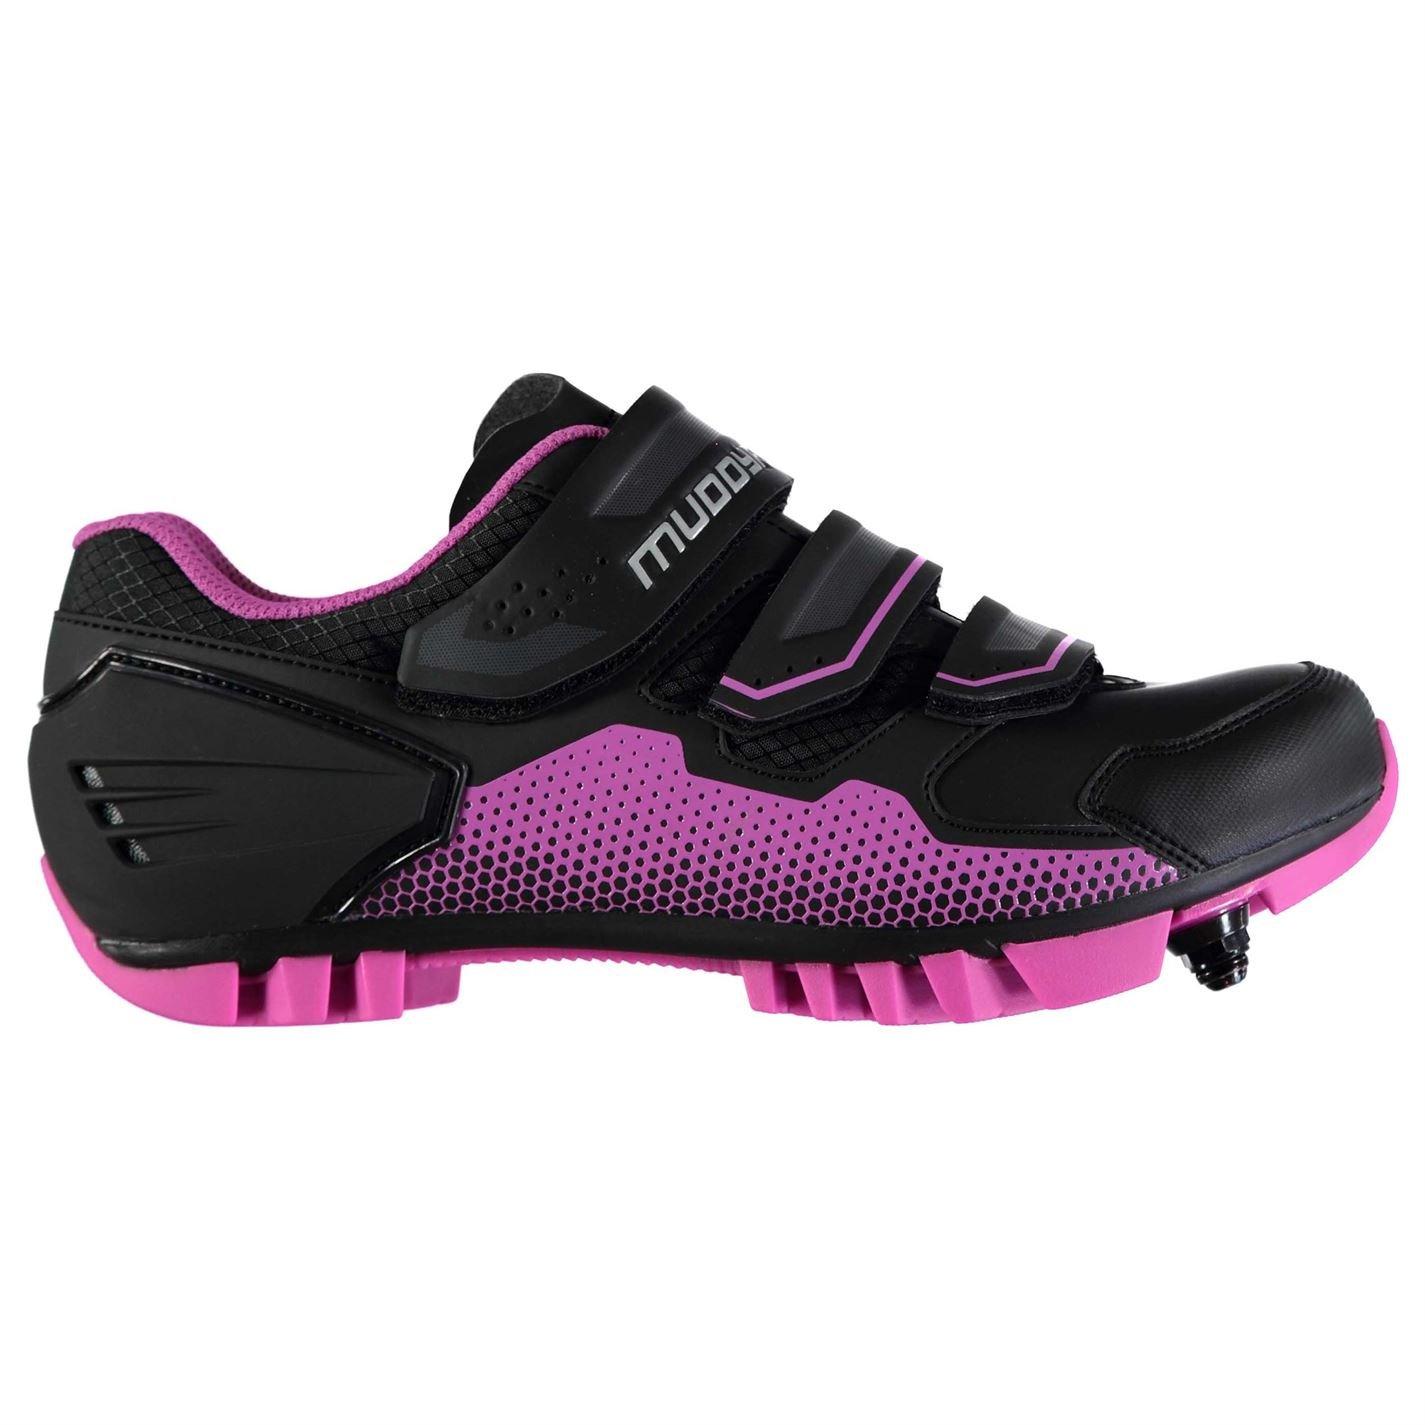 Muddyfox Womens MTB100 Cycling Shoes Waterproof Lightweight